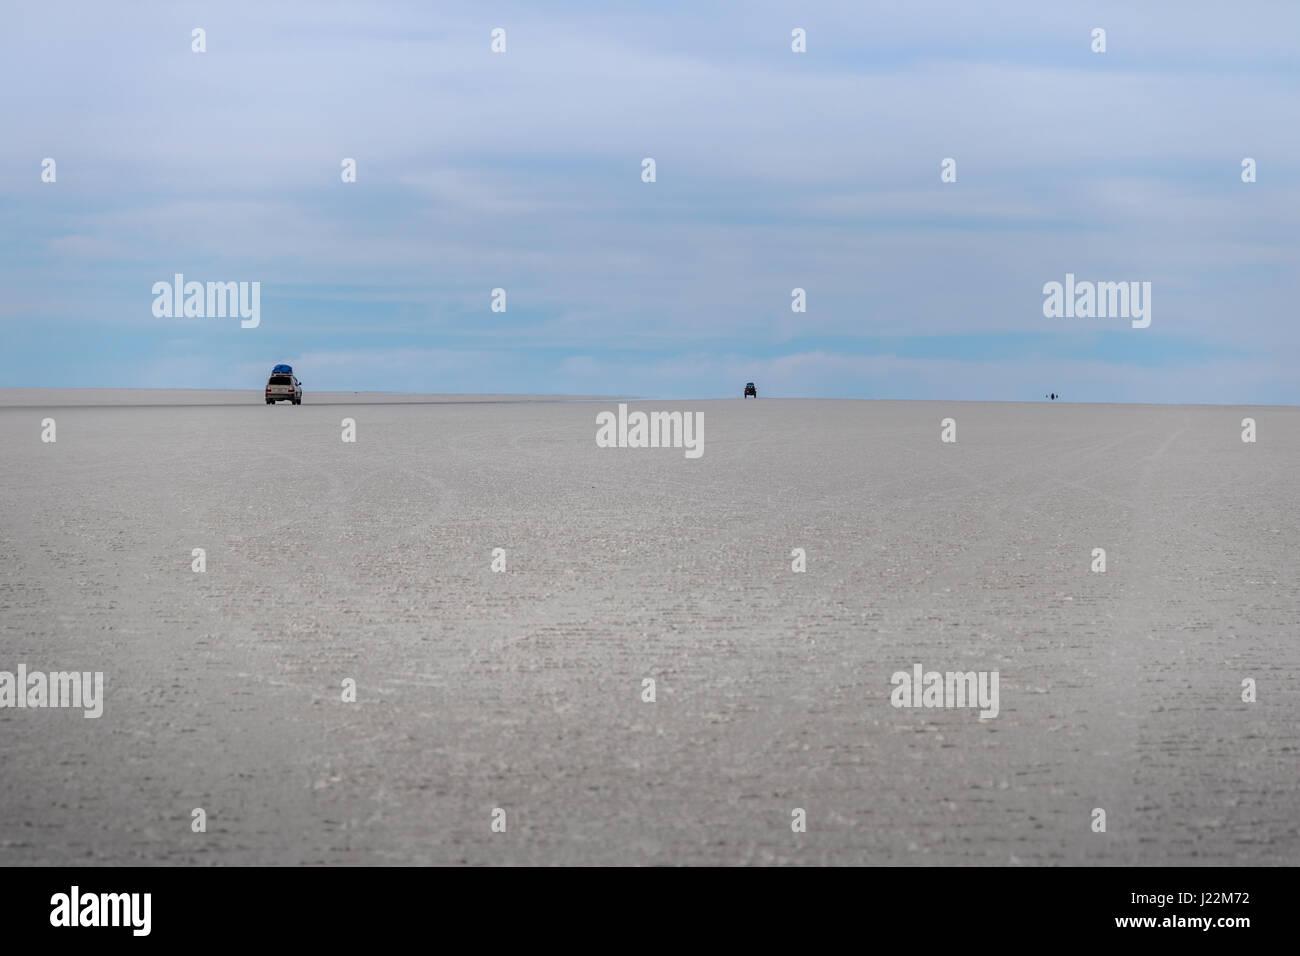 Cars disappearing into horizon in Salar de Uyuni salt flat - Potosi Department, Bolivia - Stock Image